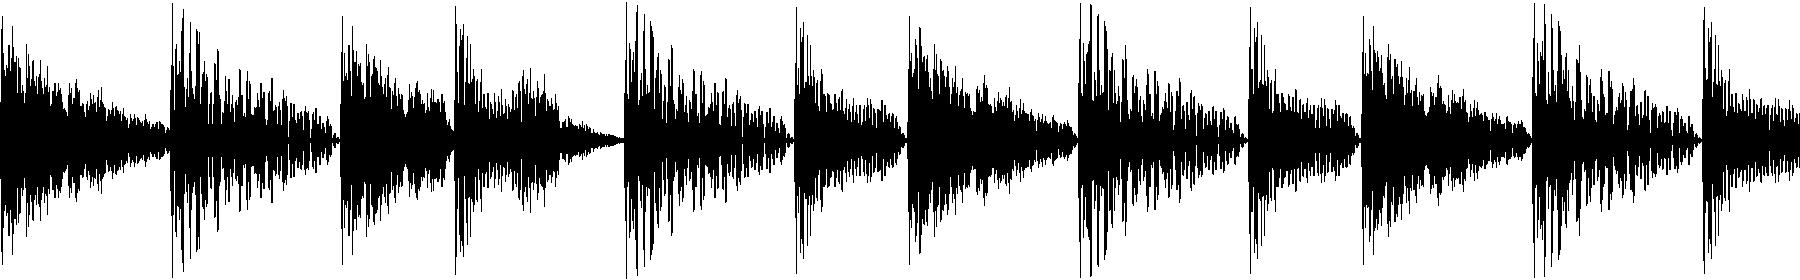 bluezone bc0210 percussion loop 007 110